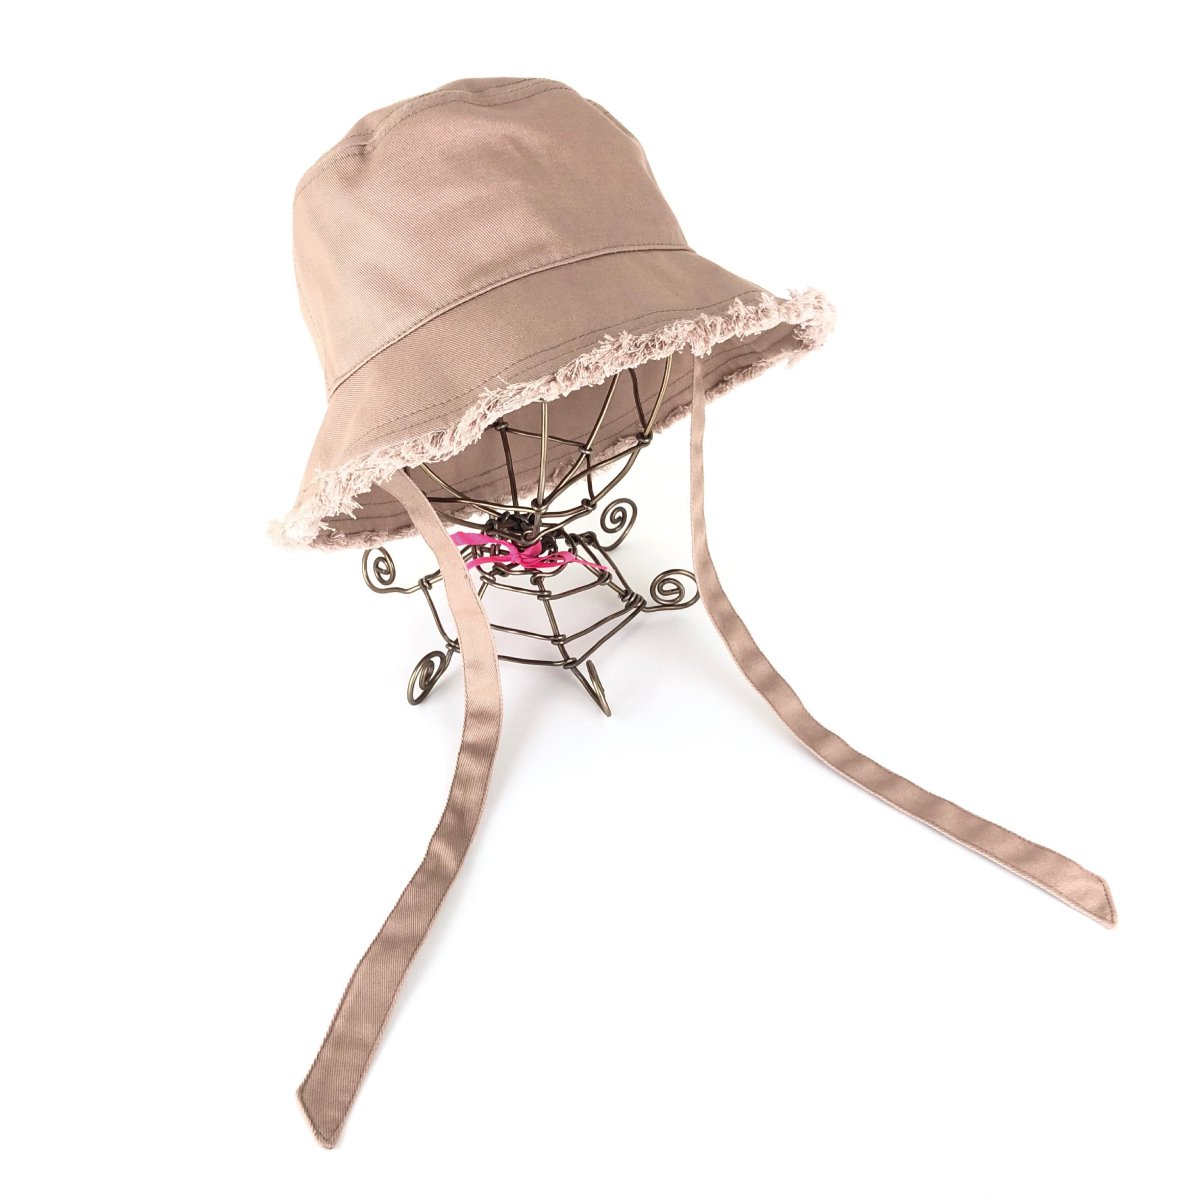 【KIDS】Kids Fringe Hat 詳細画像5